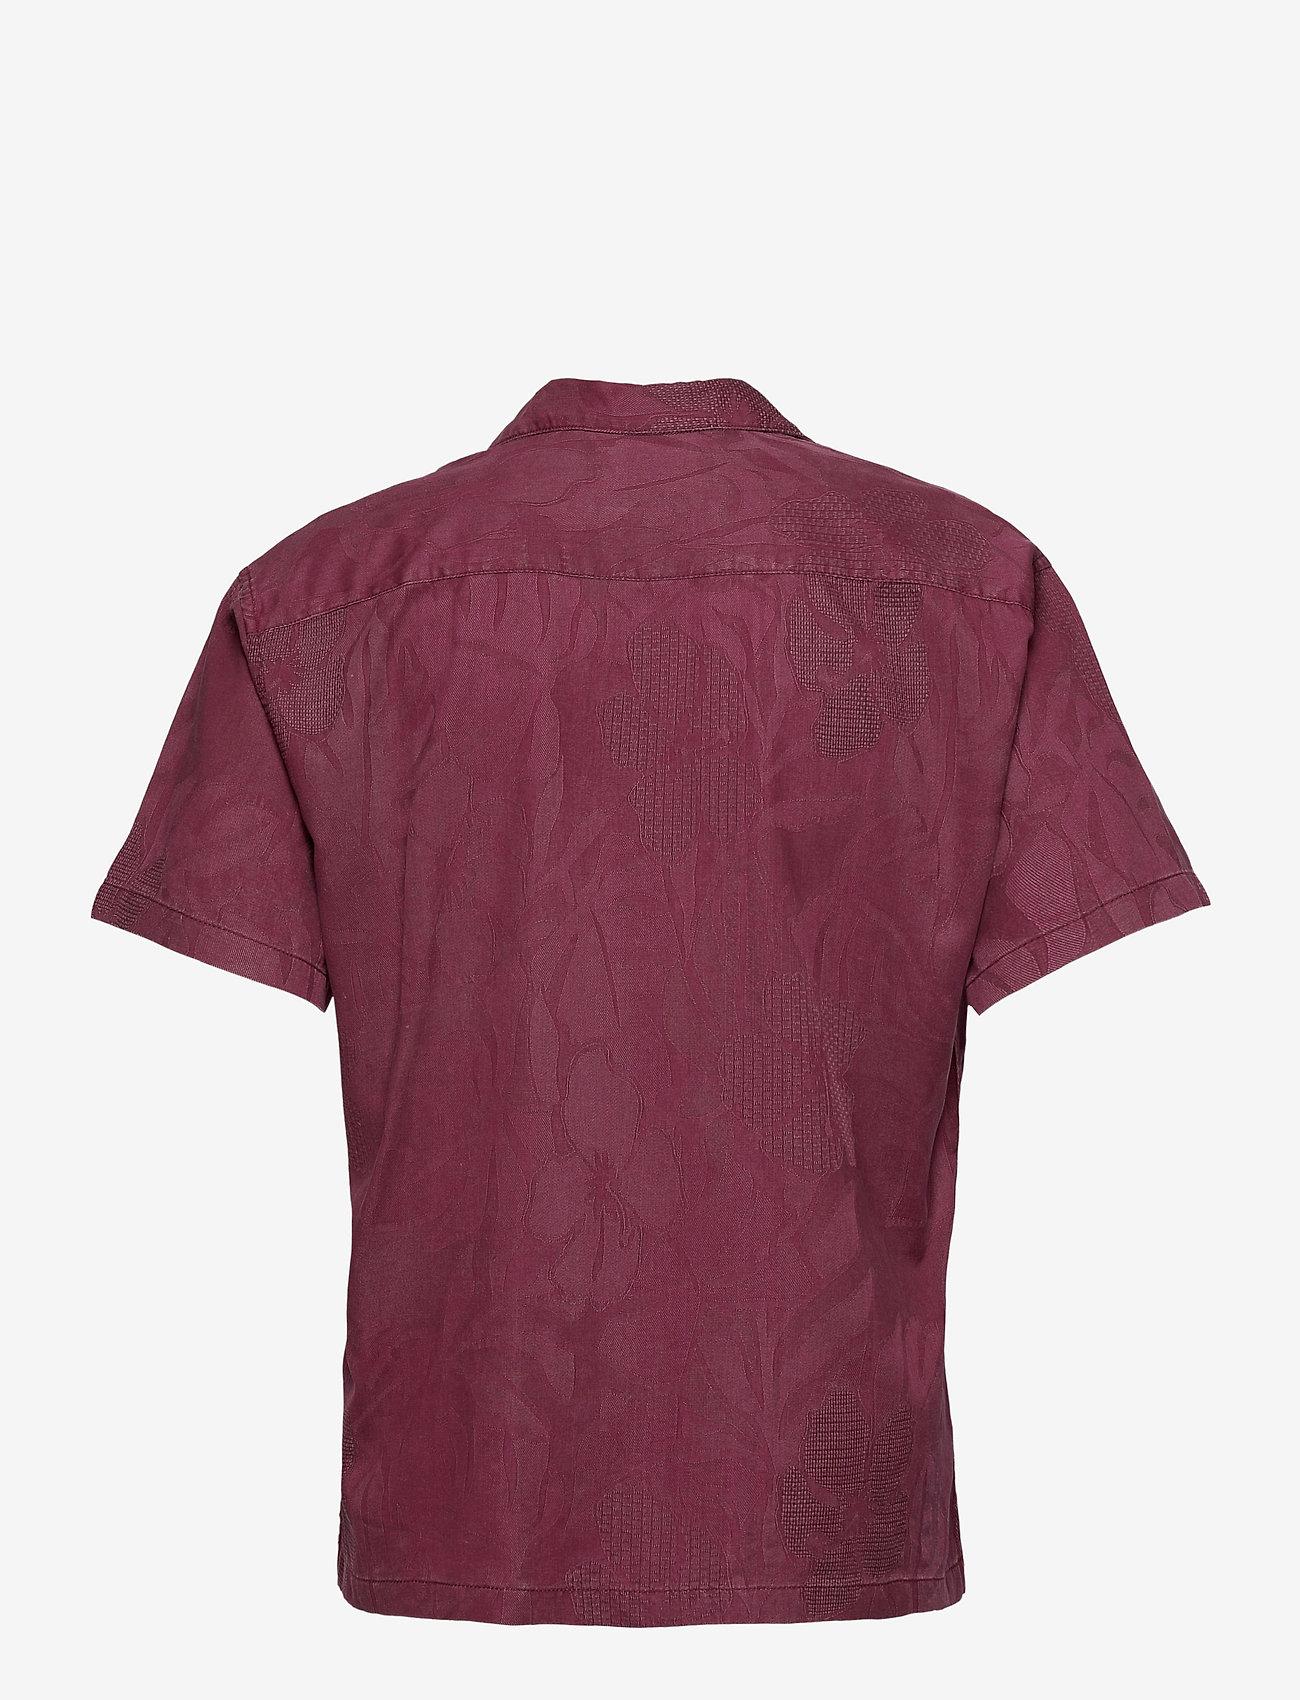 Jack & Jones - JPRBLUCOOPER RESORT SHIRT S/S RELAX - linneskjortor - zinfandel - 1